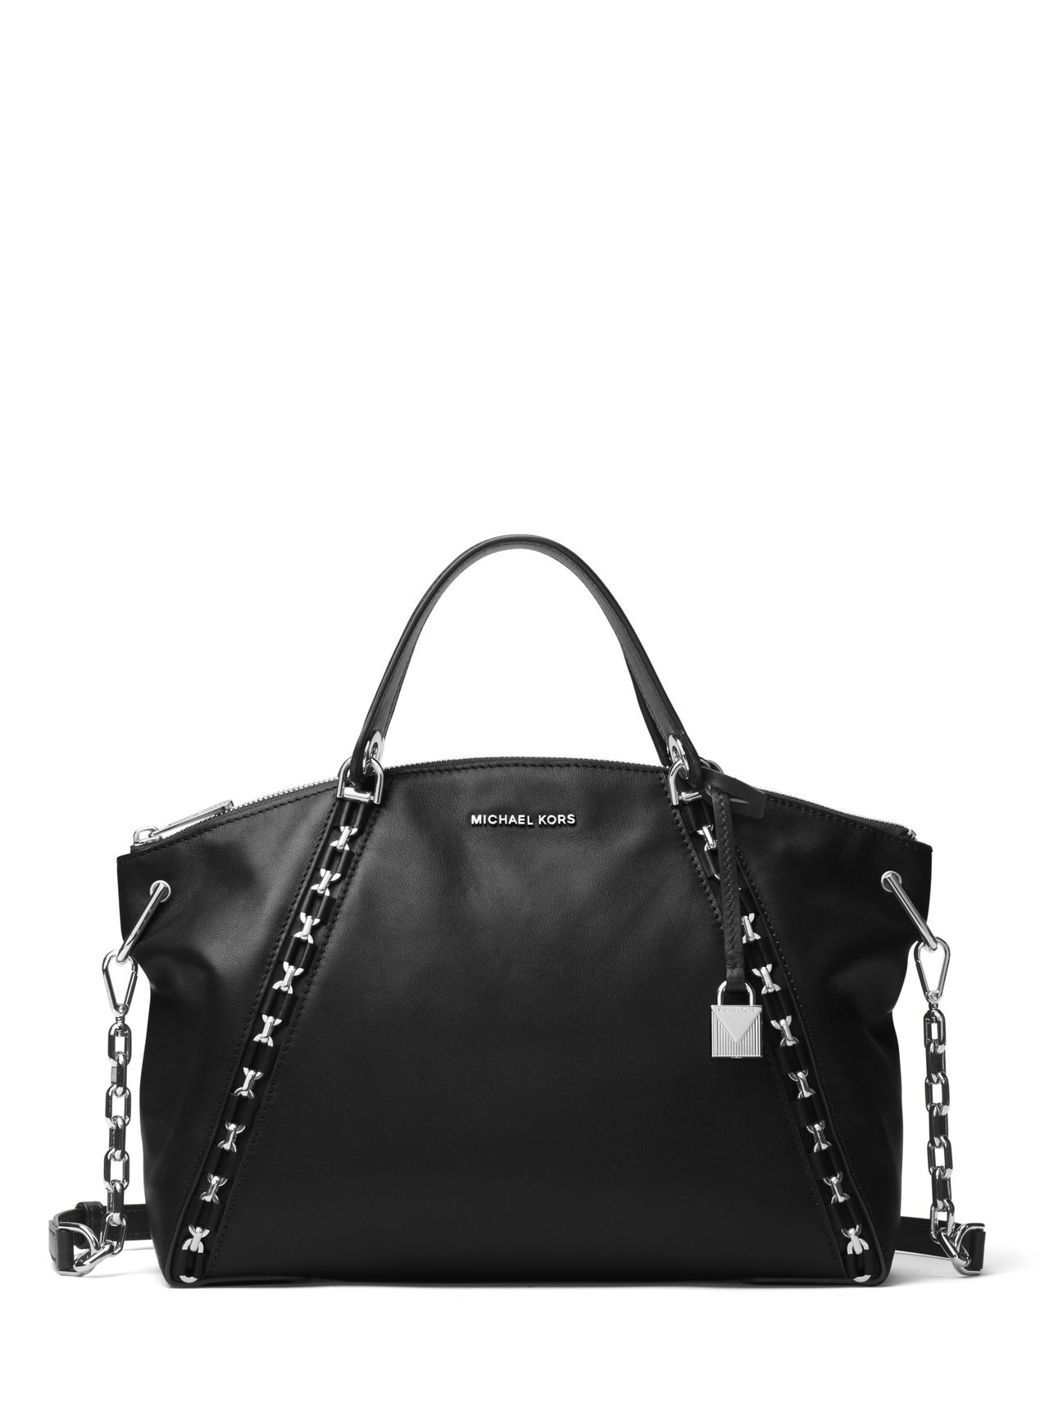 SADIE經典黑提包,售價21,700元。圖/MICHAEL KORS提供